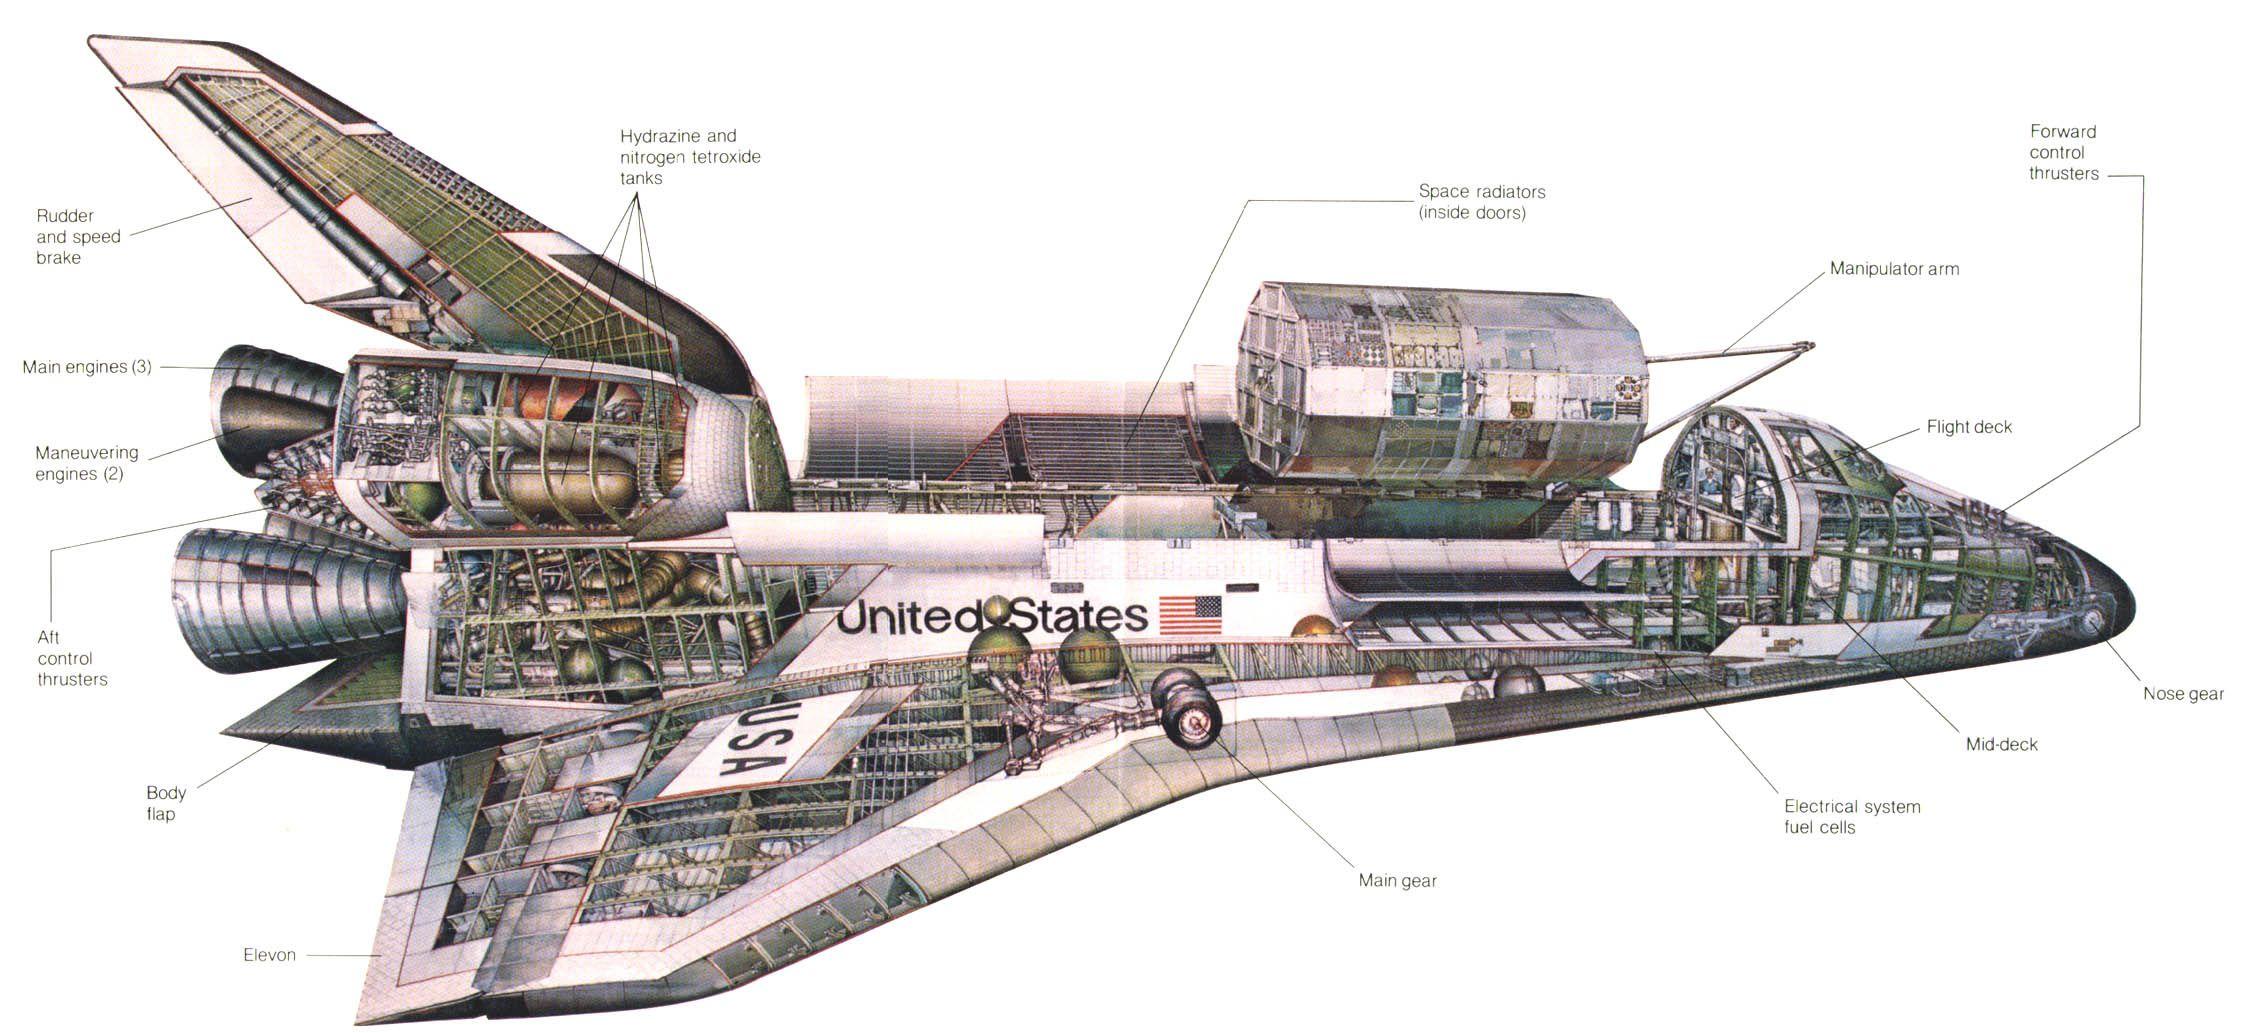 Na nasa new space shuttle design - Space Shuttle Cut Away